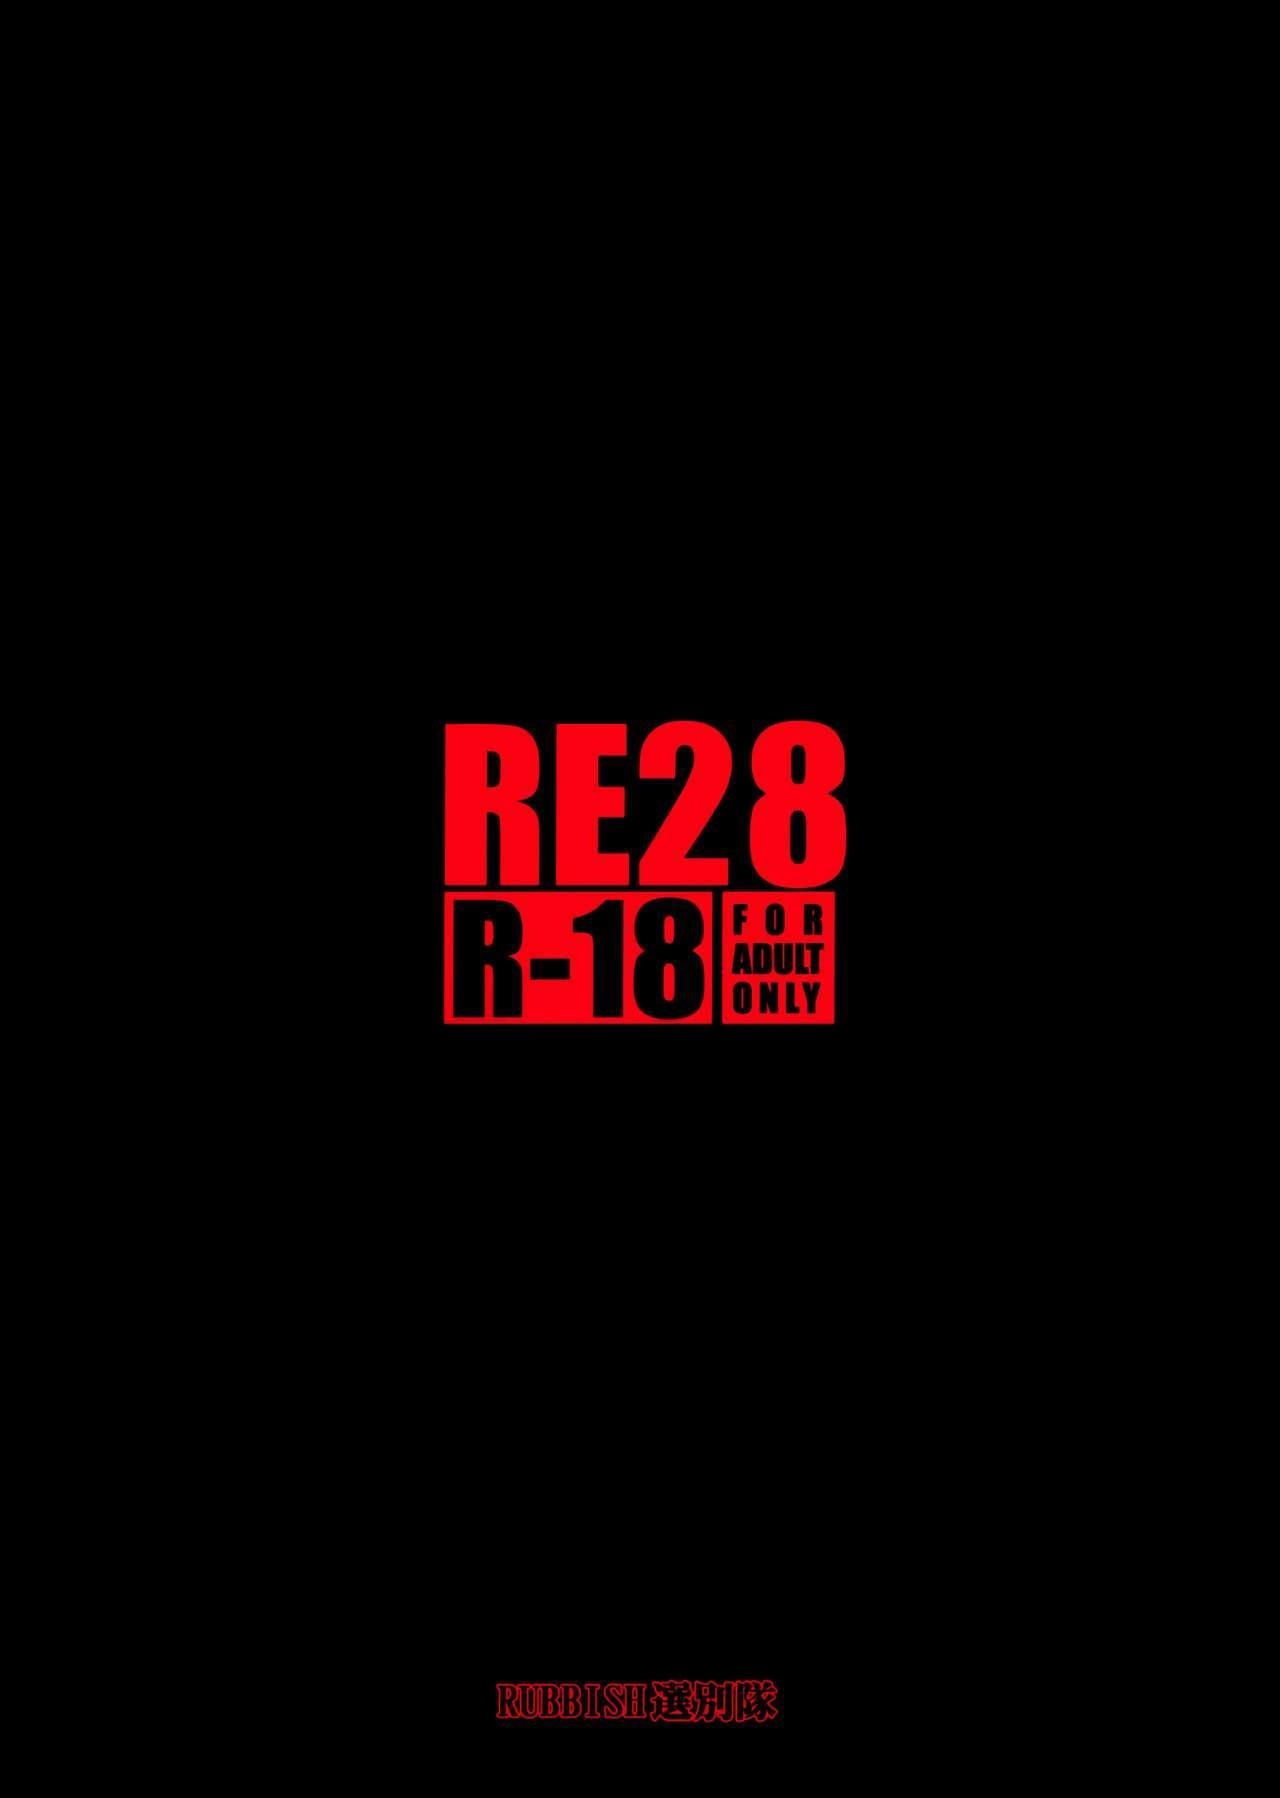 RE28 52